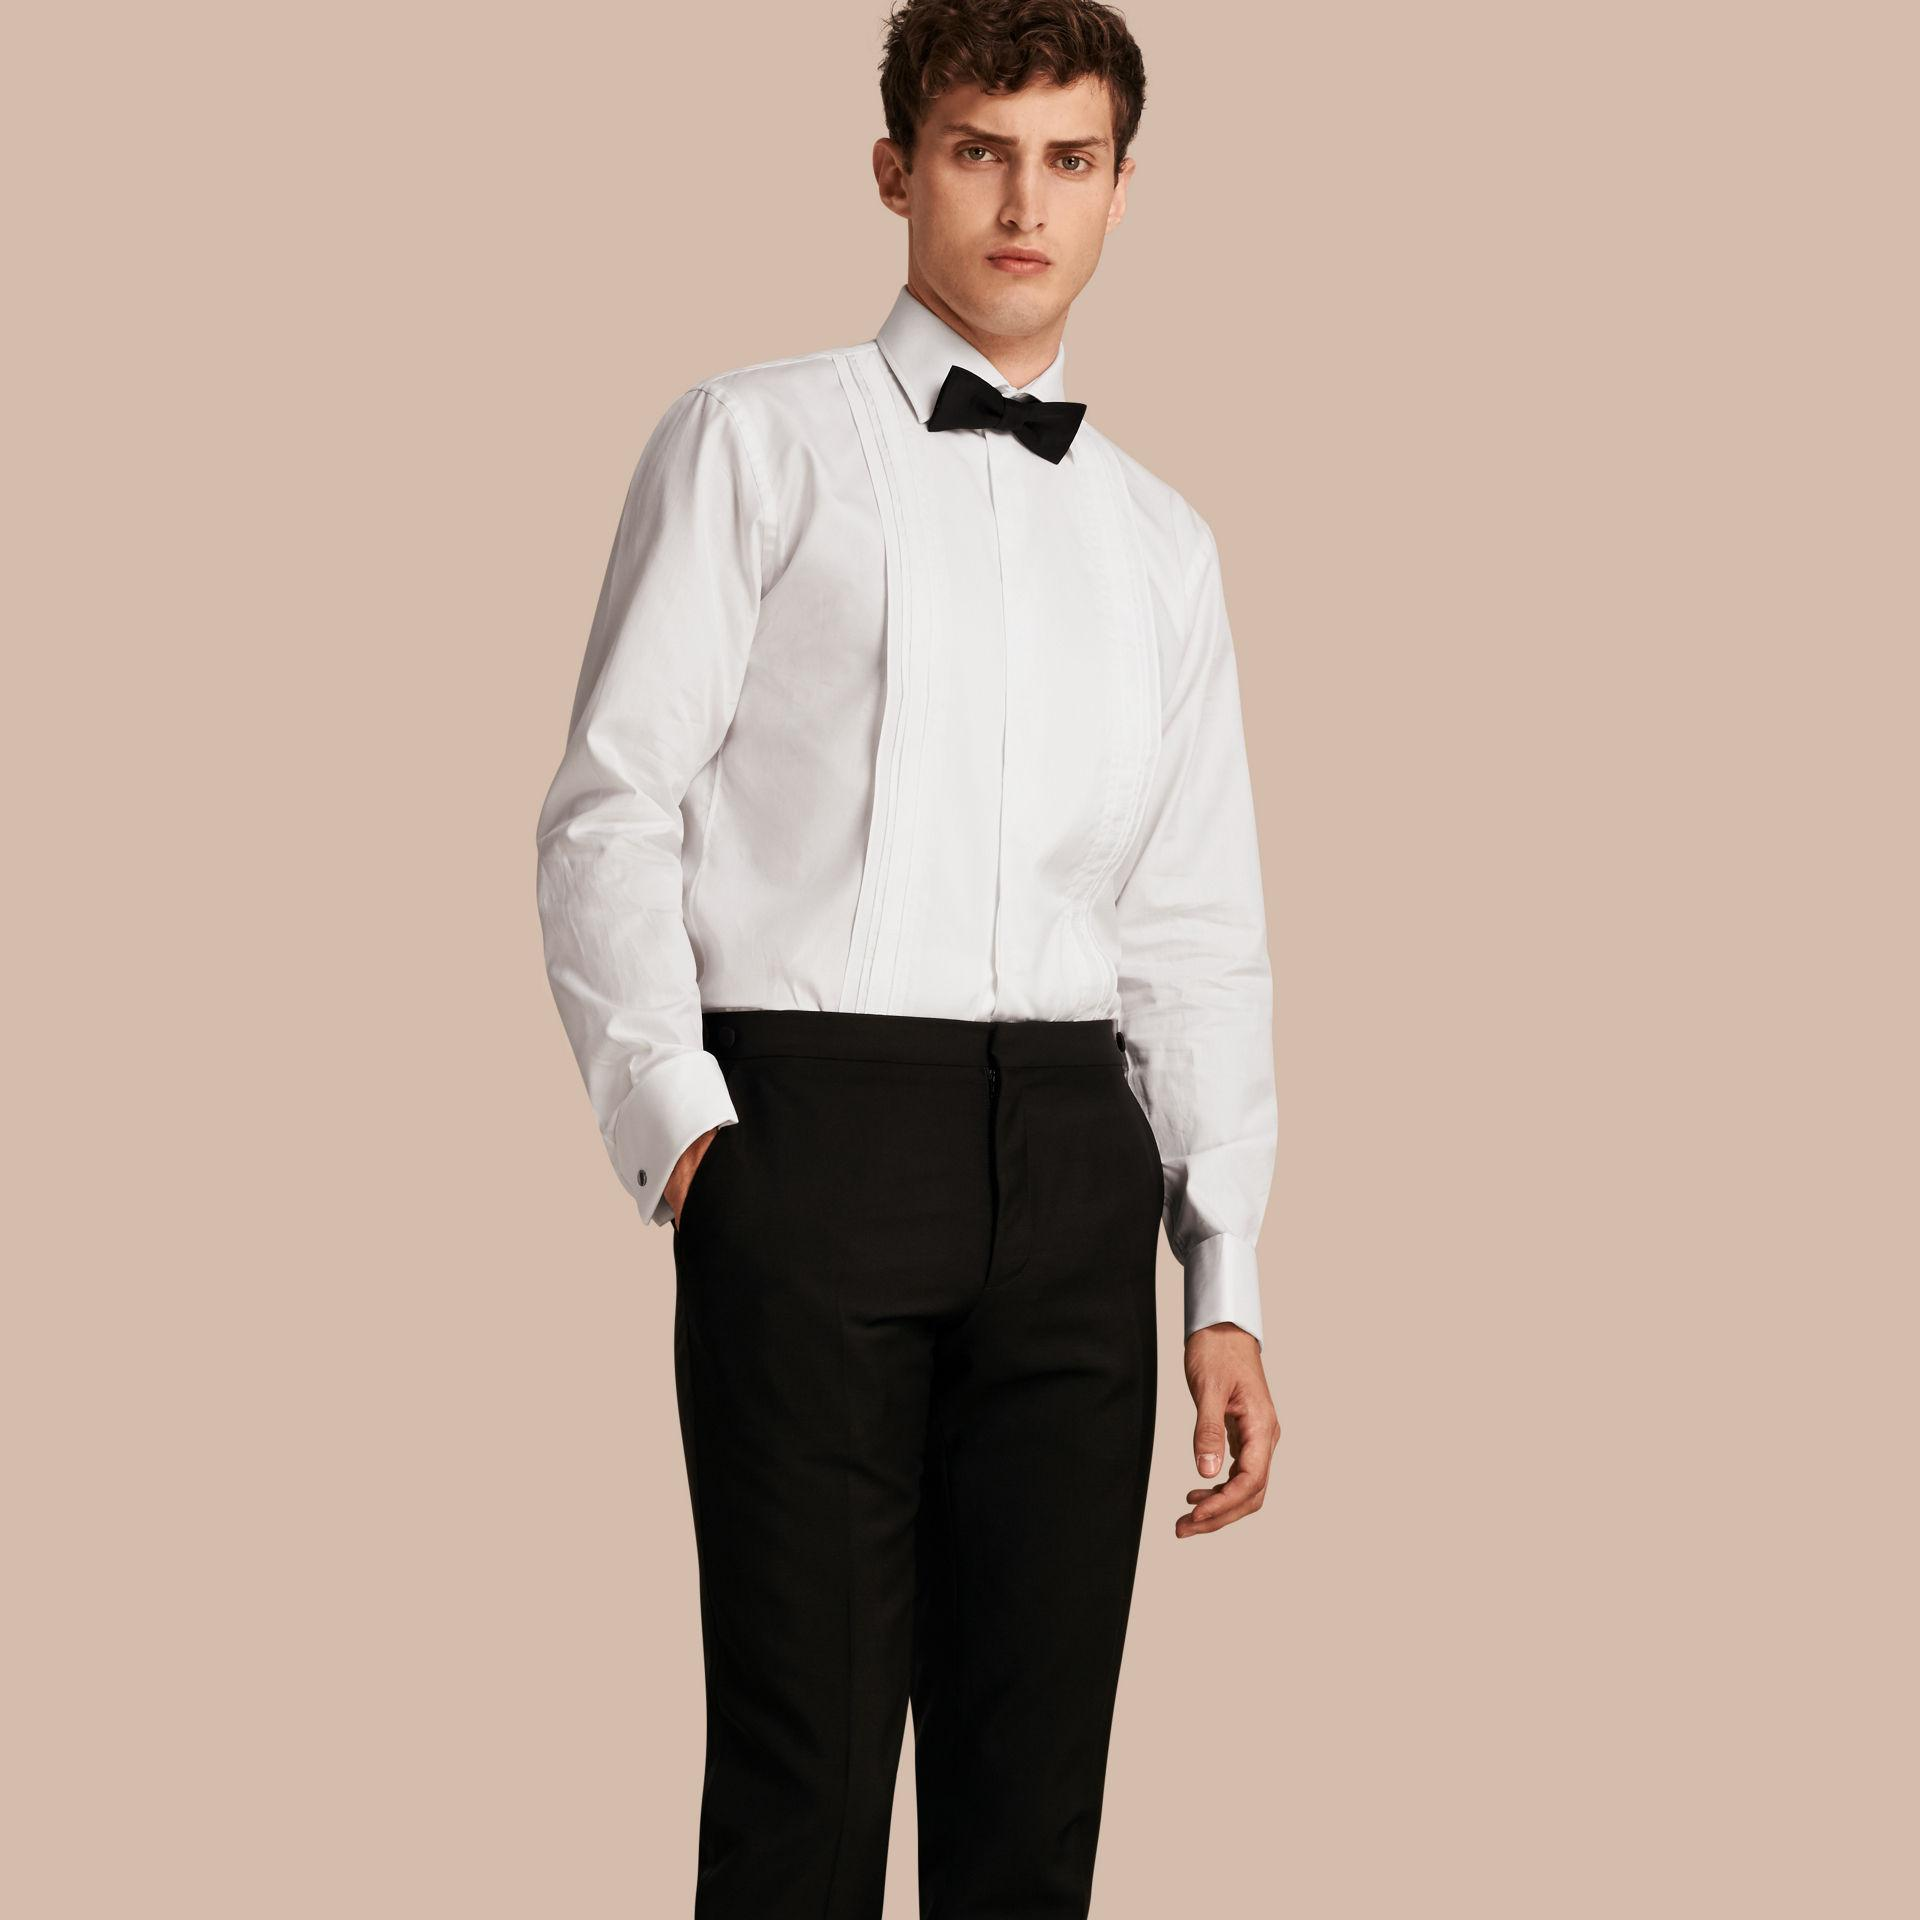 Lyst burberry modern fit double cuff pleat bib cotton for Modern fit dress shirt